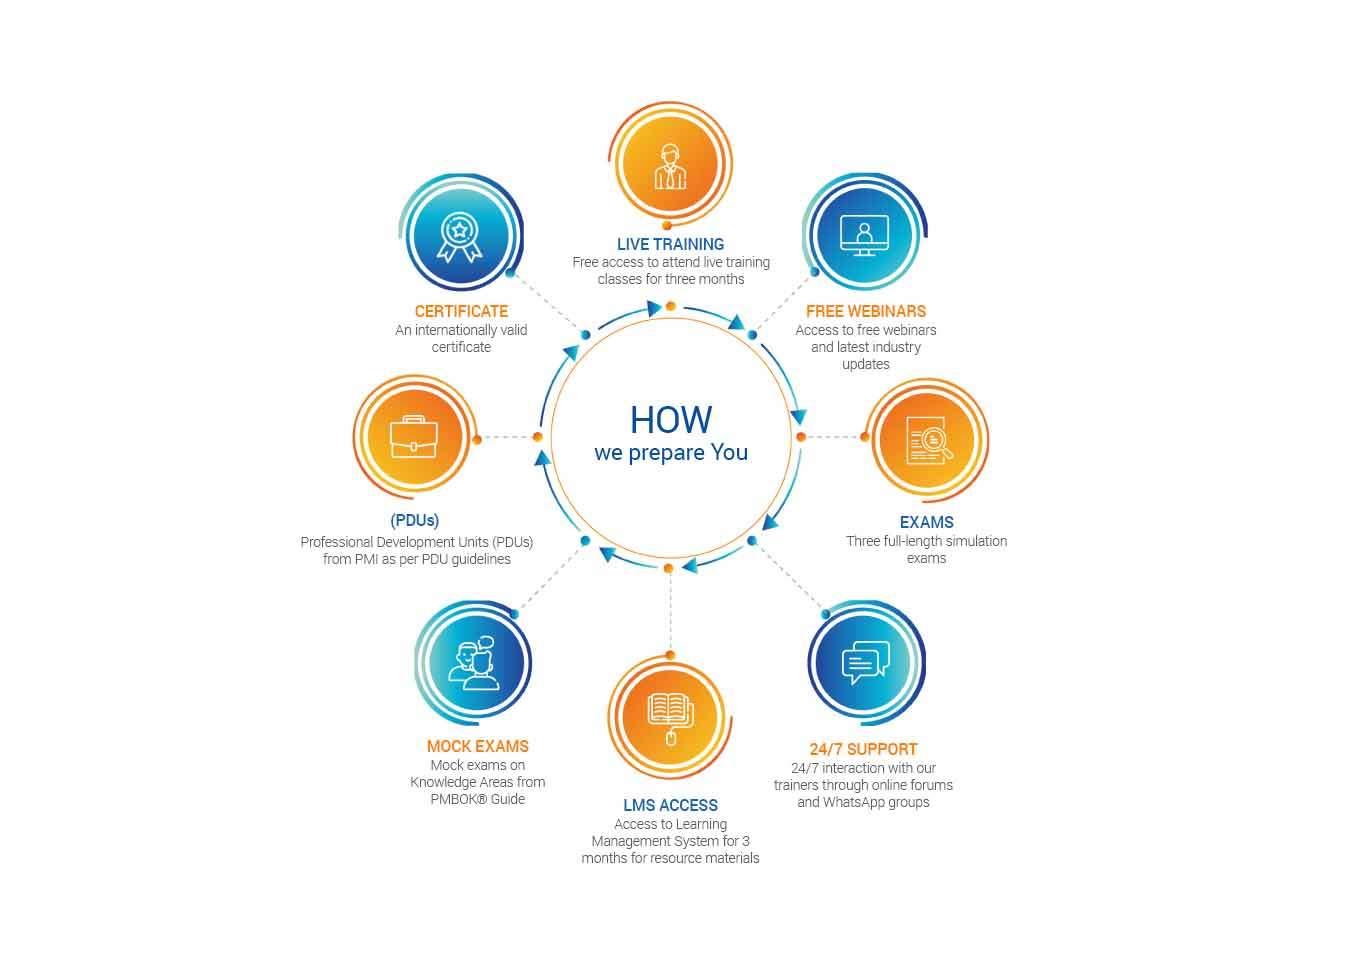 pmp certification training module-360digitmg